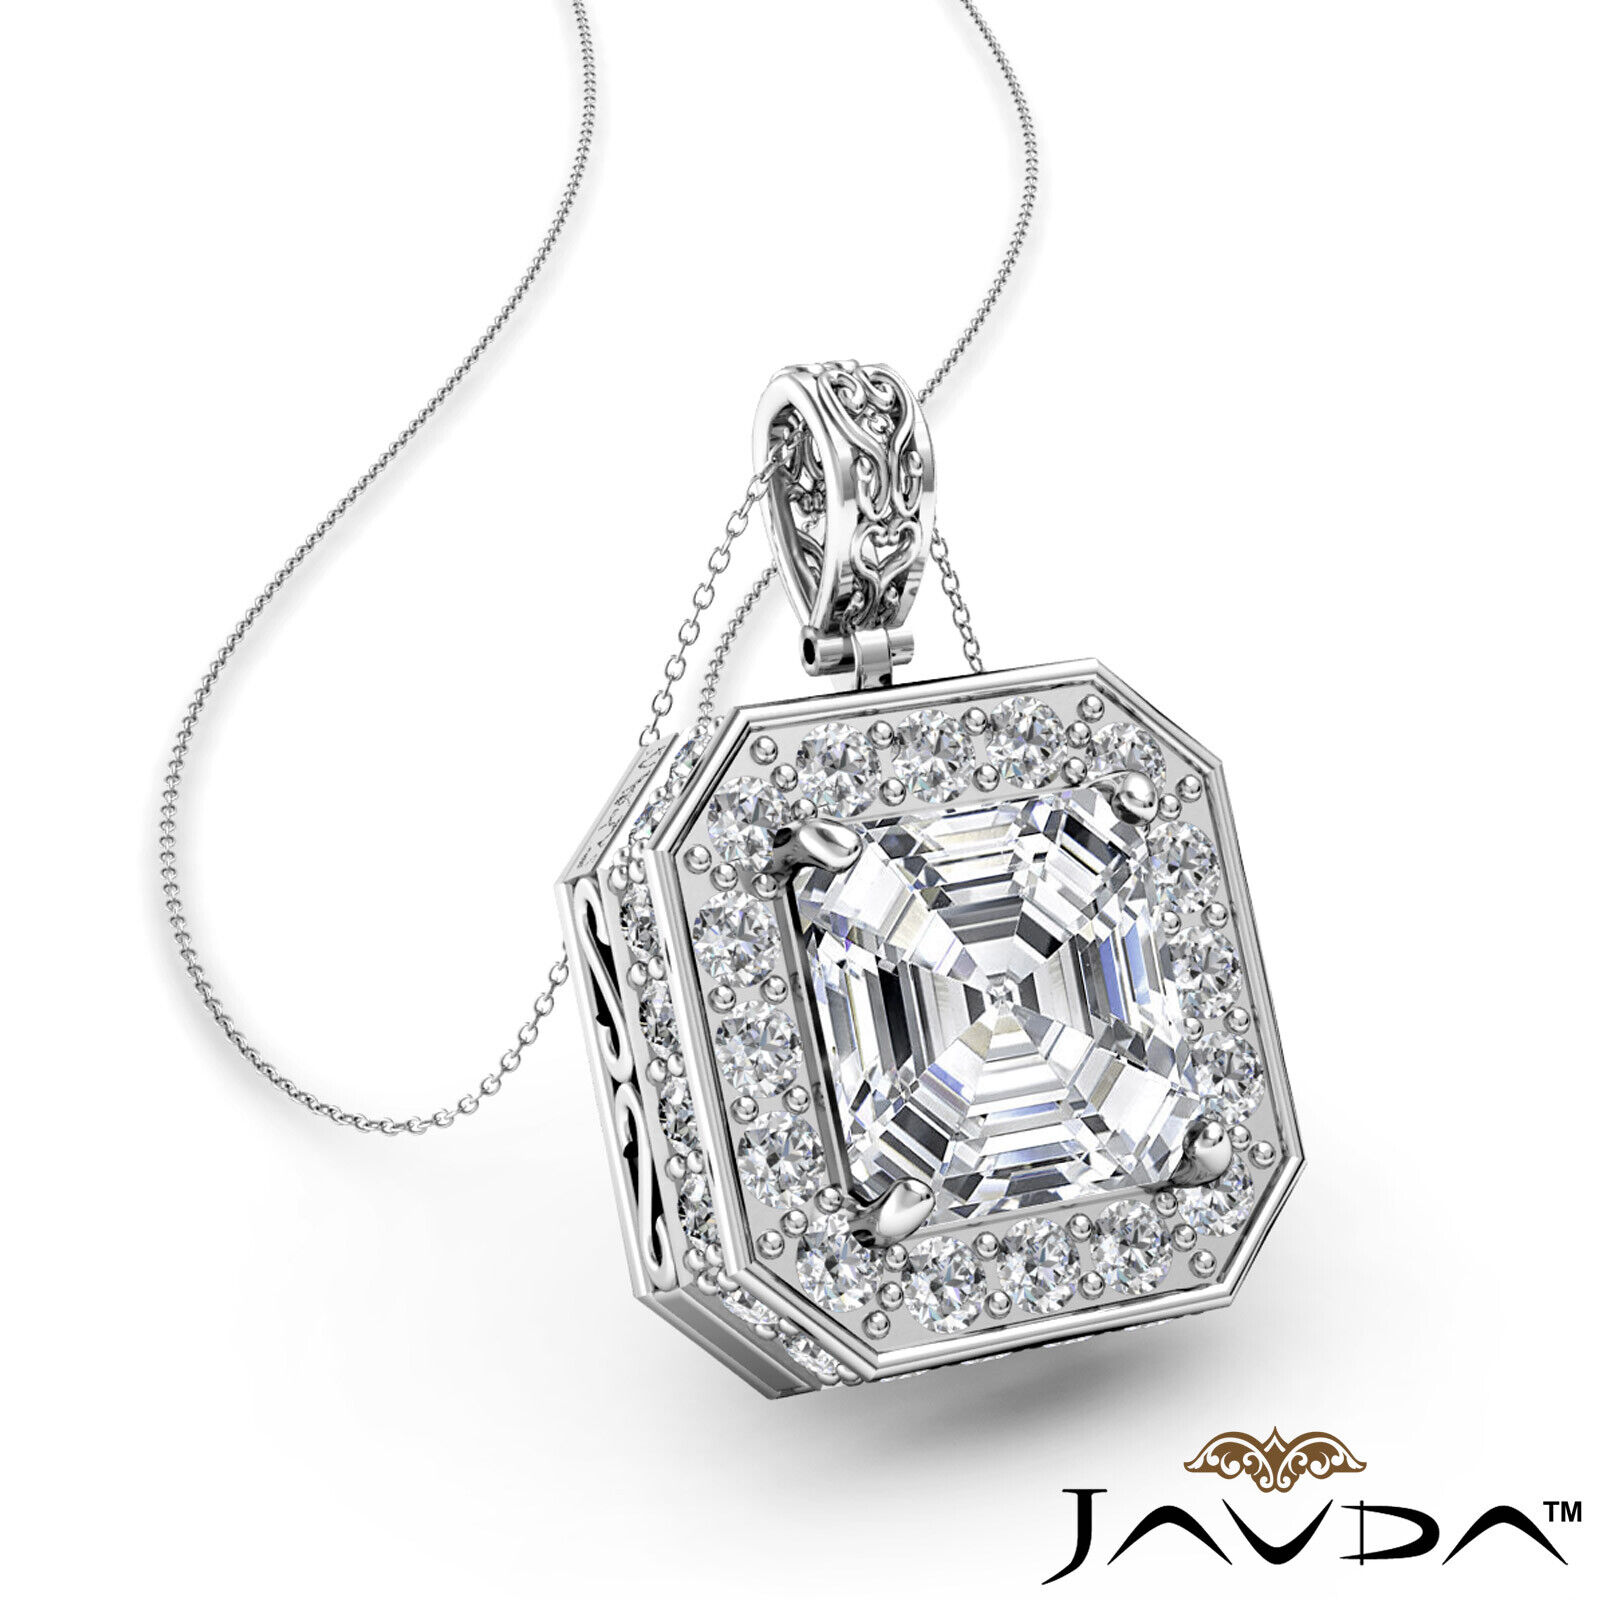 Circa Halo Asscher 100% Natural Diamond Micro Pave Set Pendant Necklace 1.18ctw.